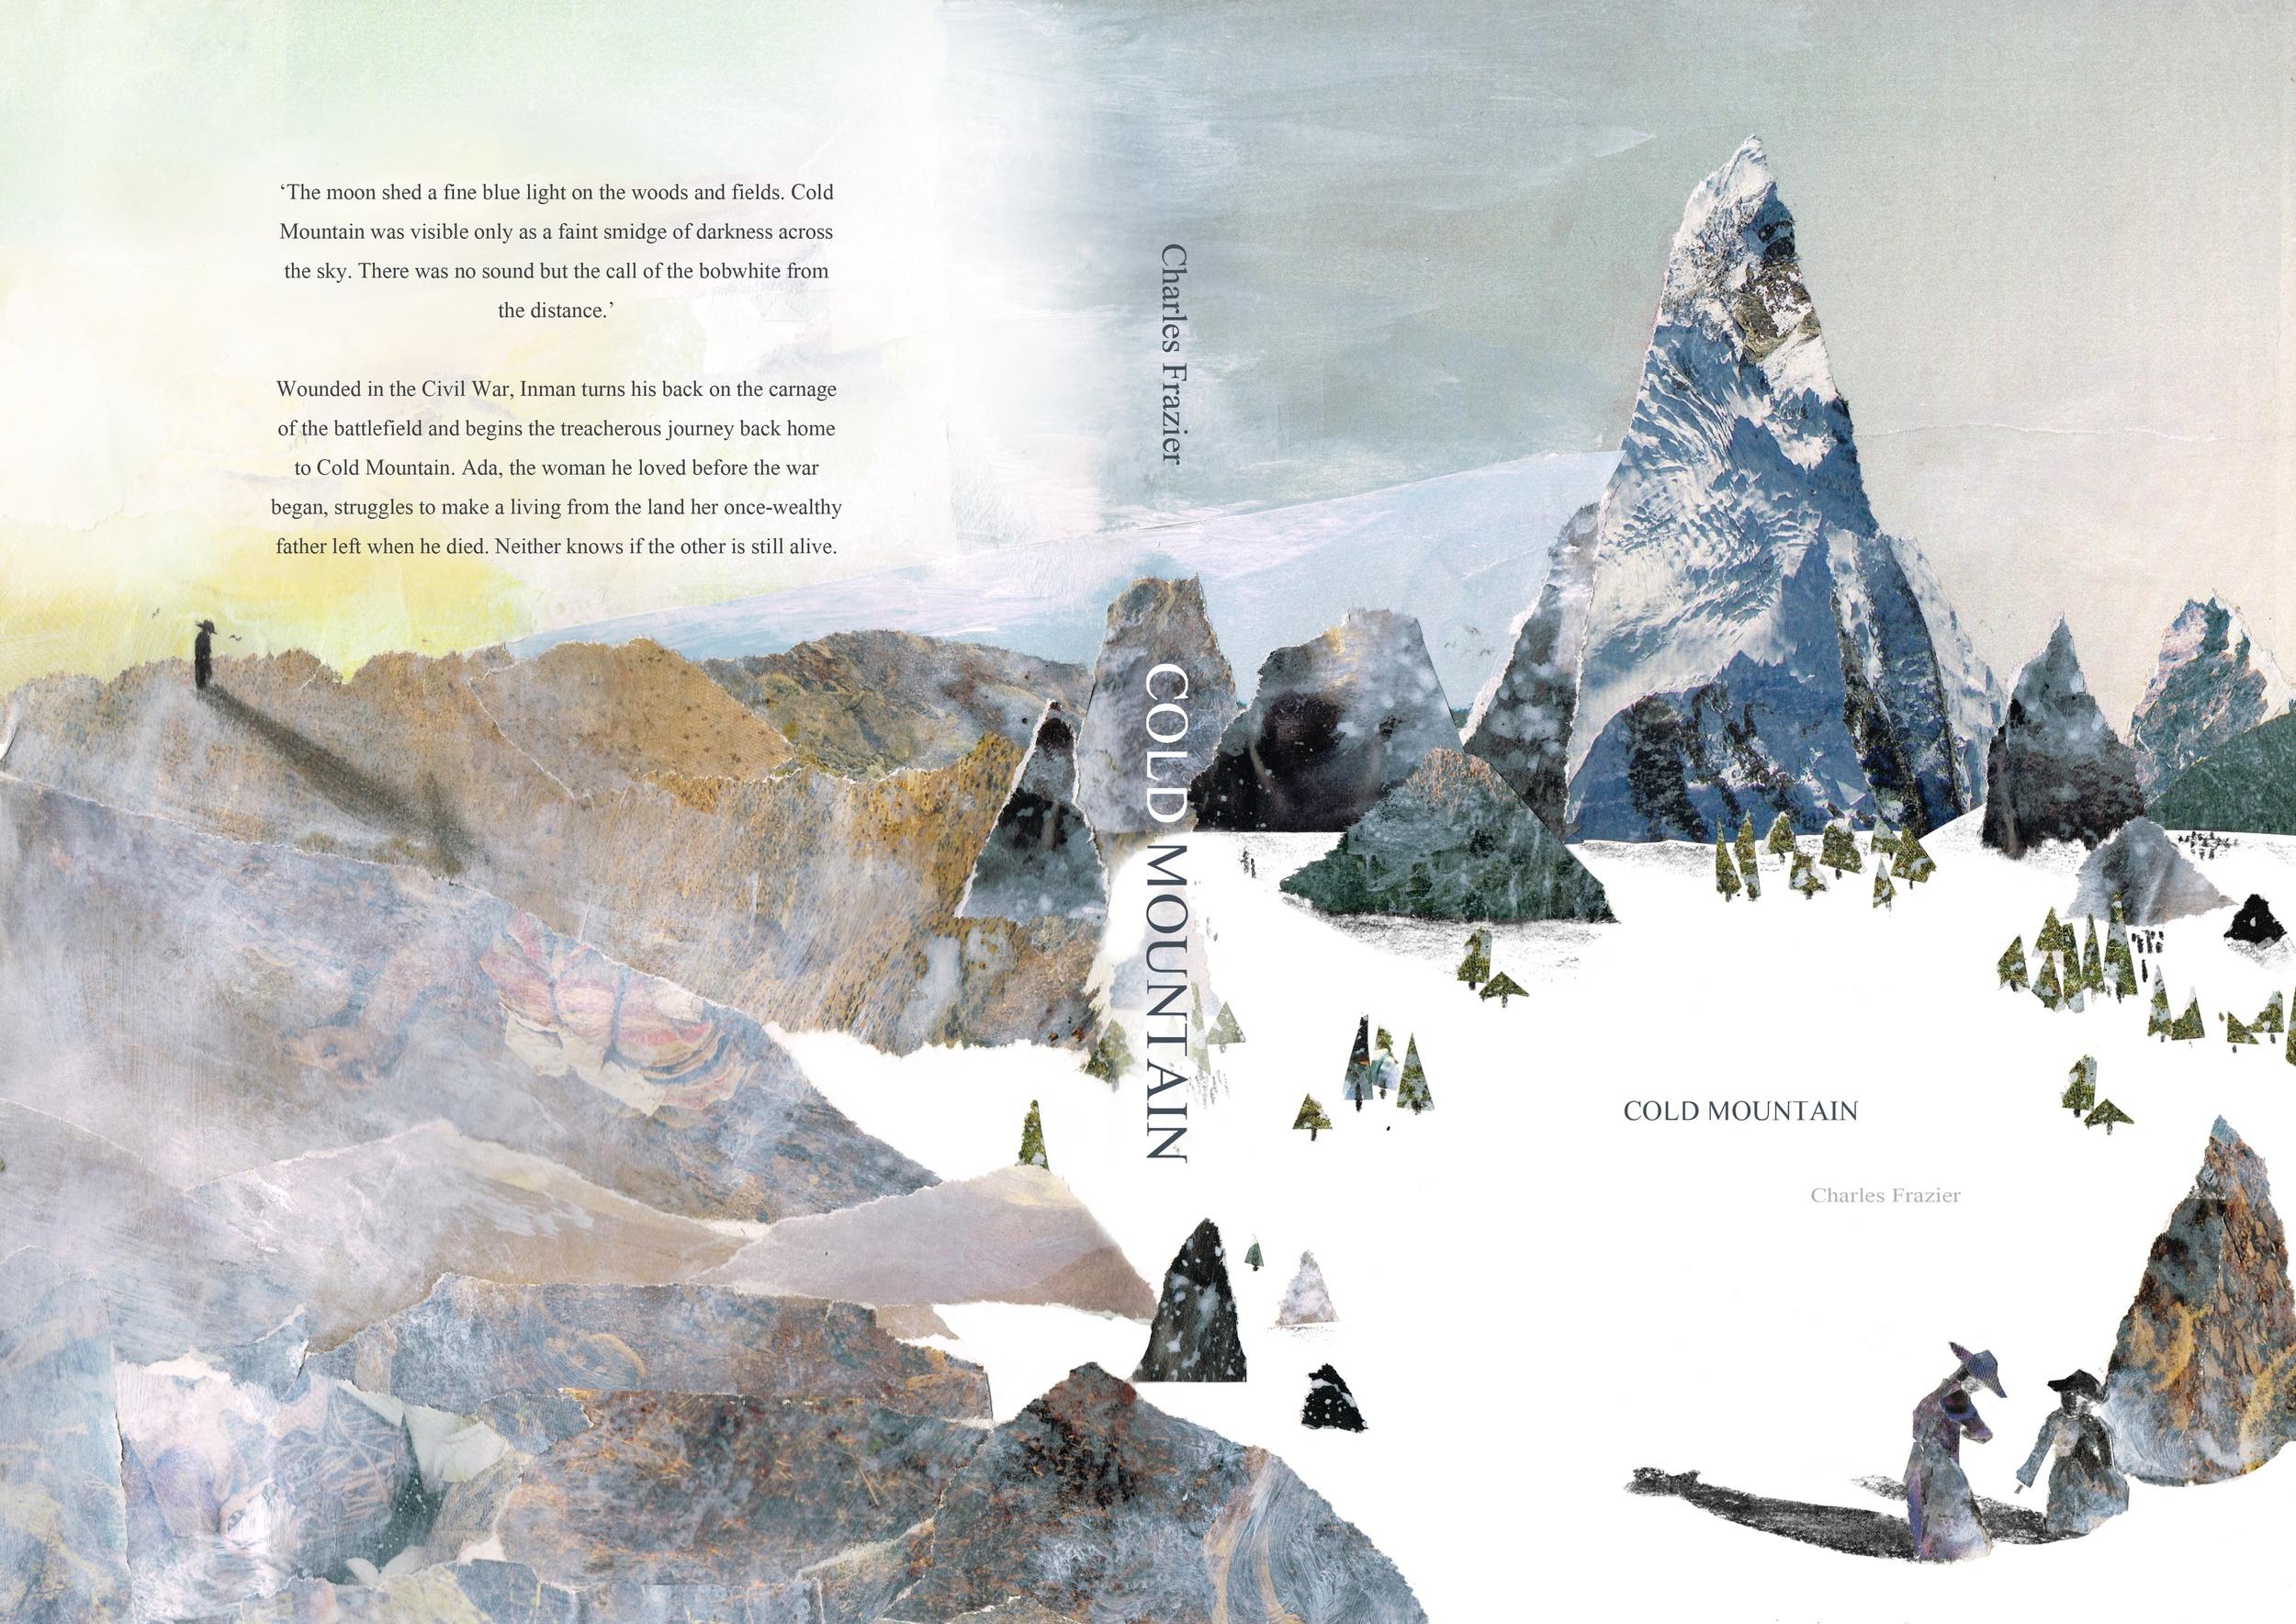 cold mountain book cover 2.jpg